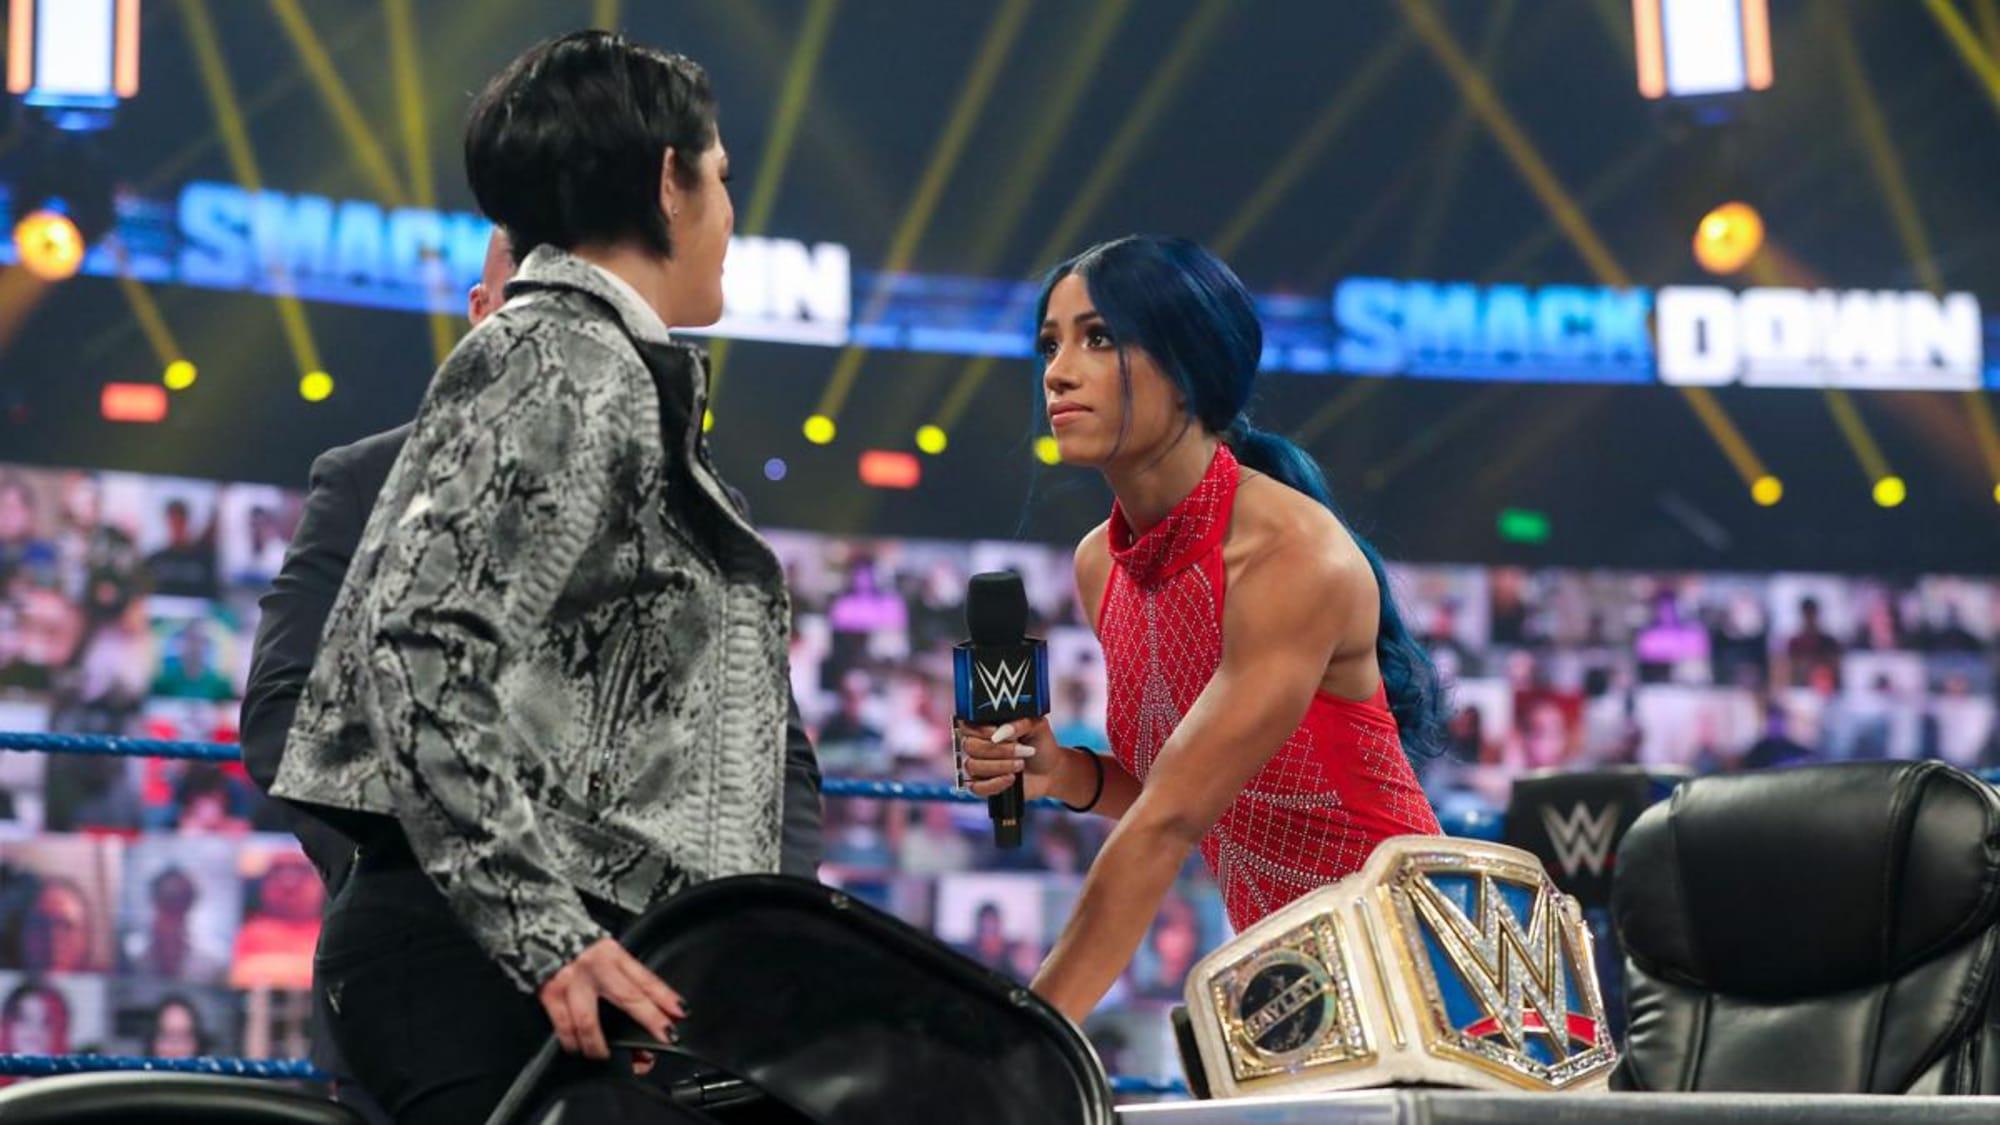 Three opponents for Sonya Deville